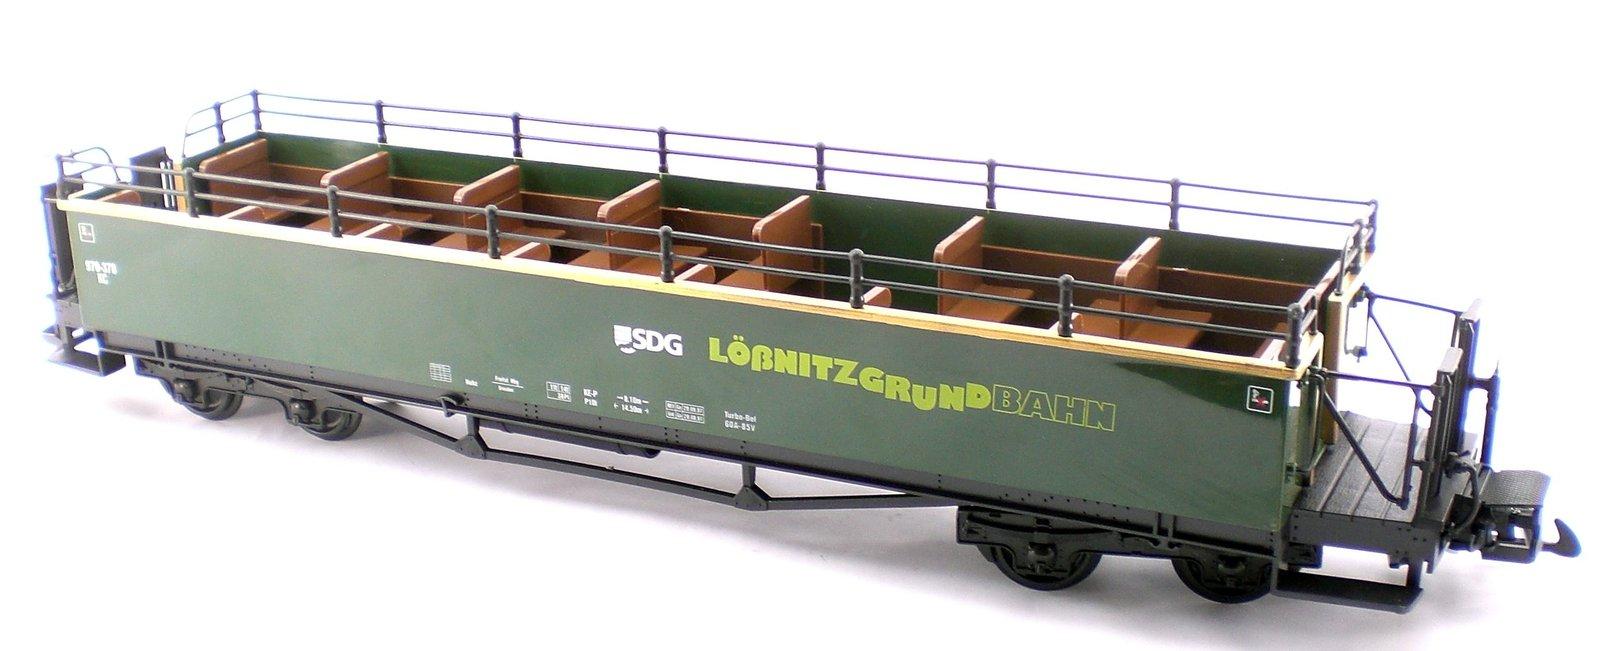 Lobnitzgrundbahn Rail Ways Observation And Sight Seeing Passenger Train Car